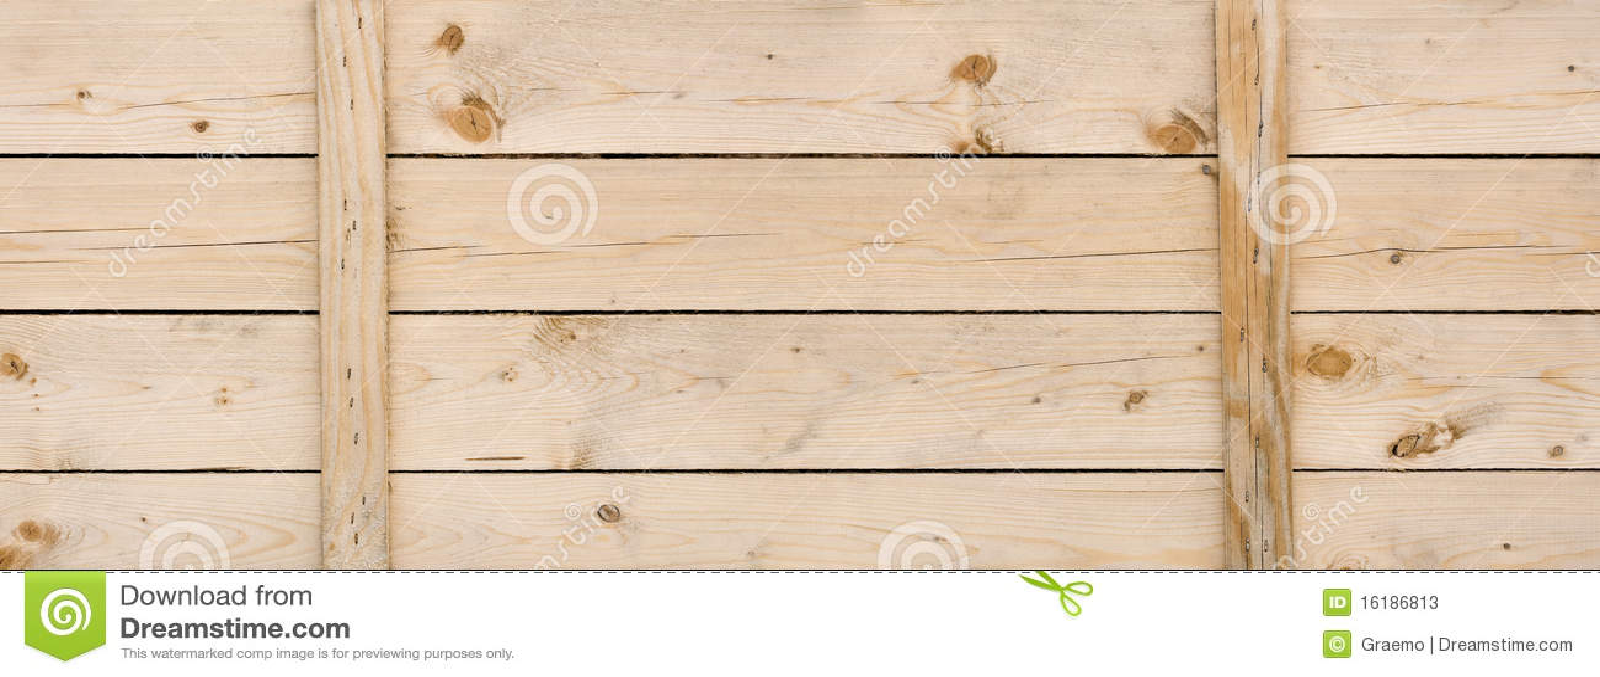 Texture Of Wooden Cargo Crate